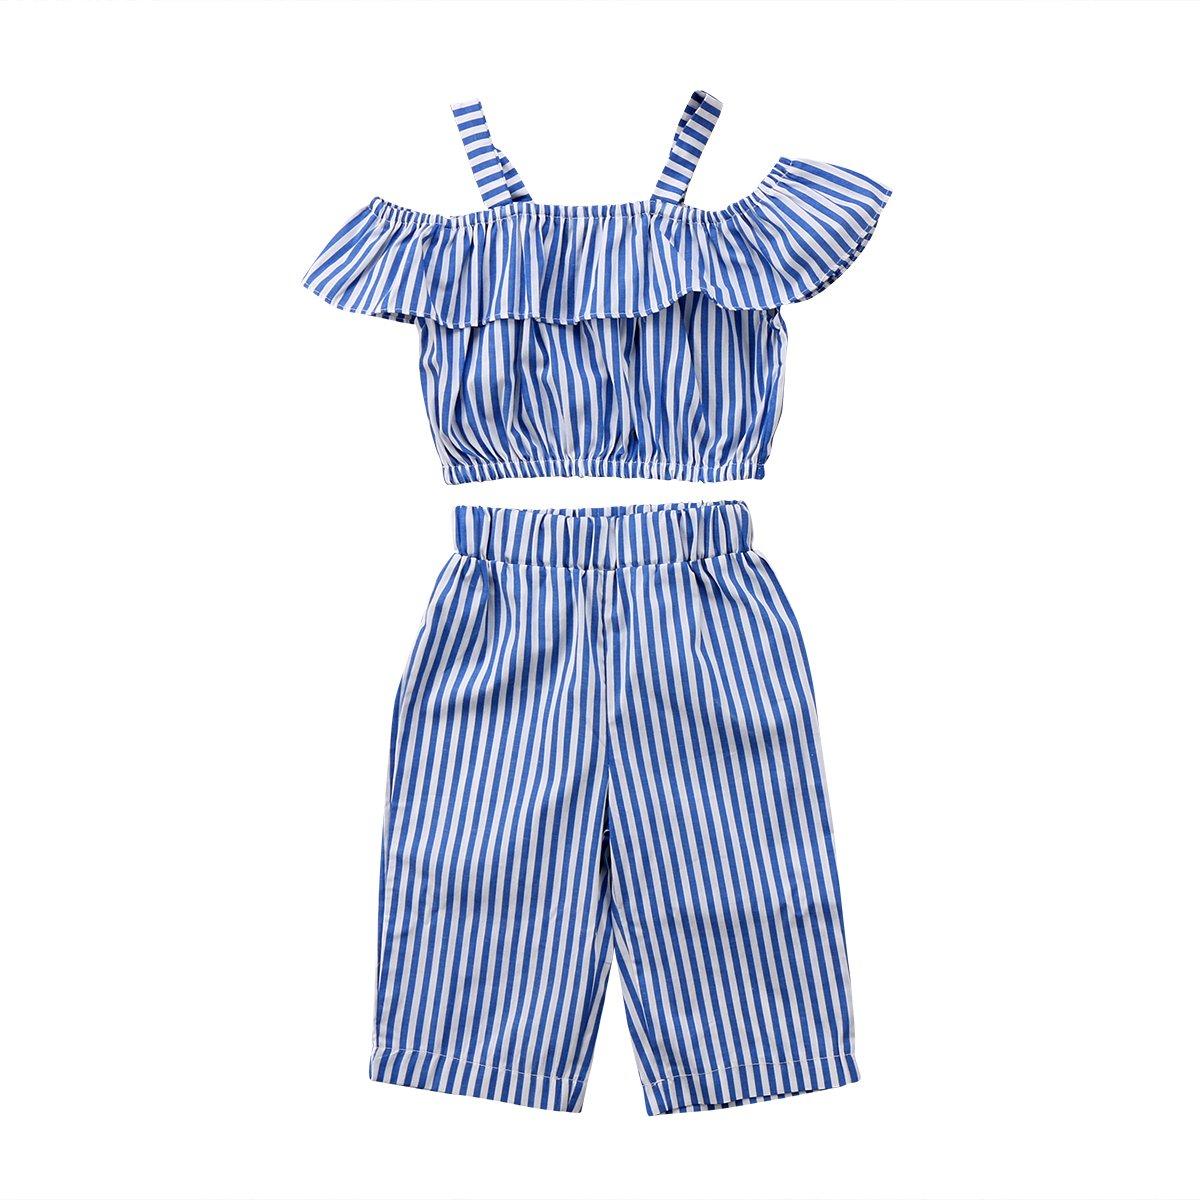 2Pcs Kids Toddler Baby Girls Off Shoulder T-Shirt Tops+Long Pants Outfit Clothes Set